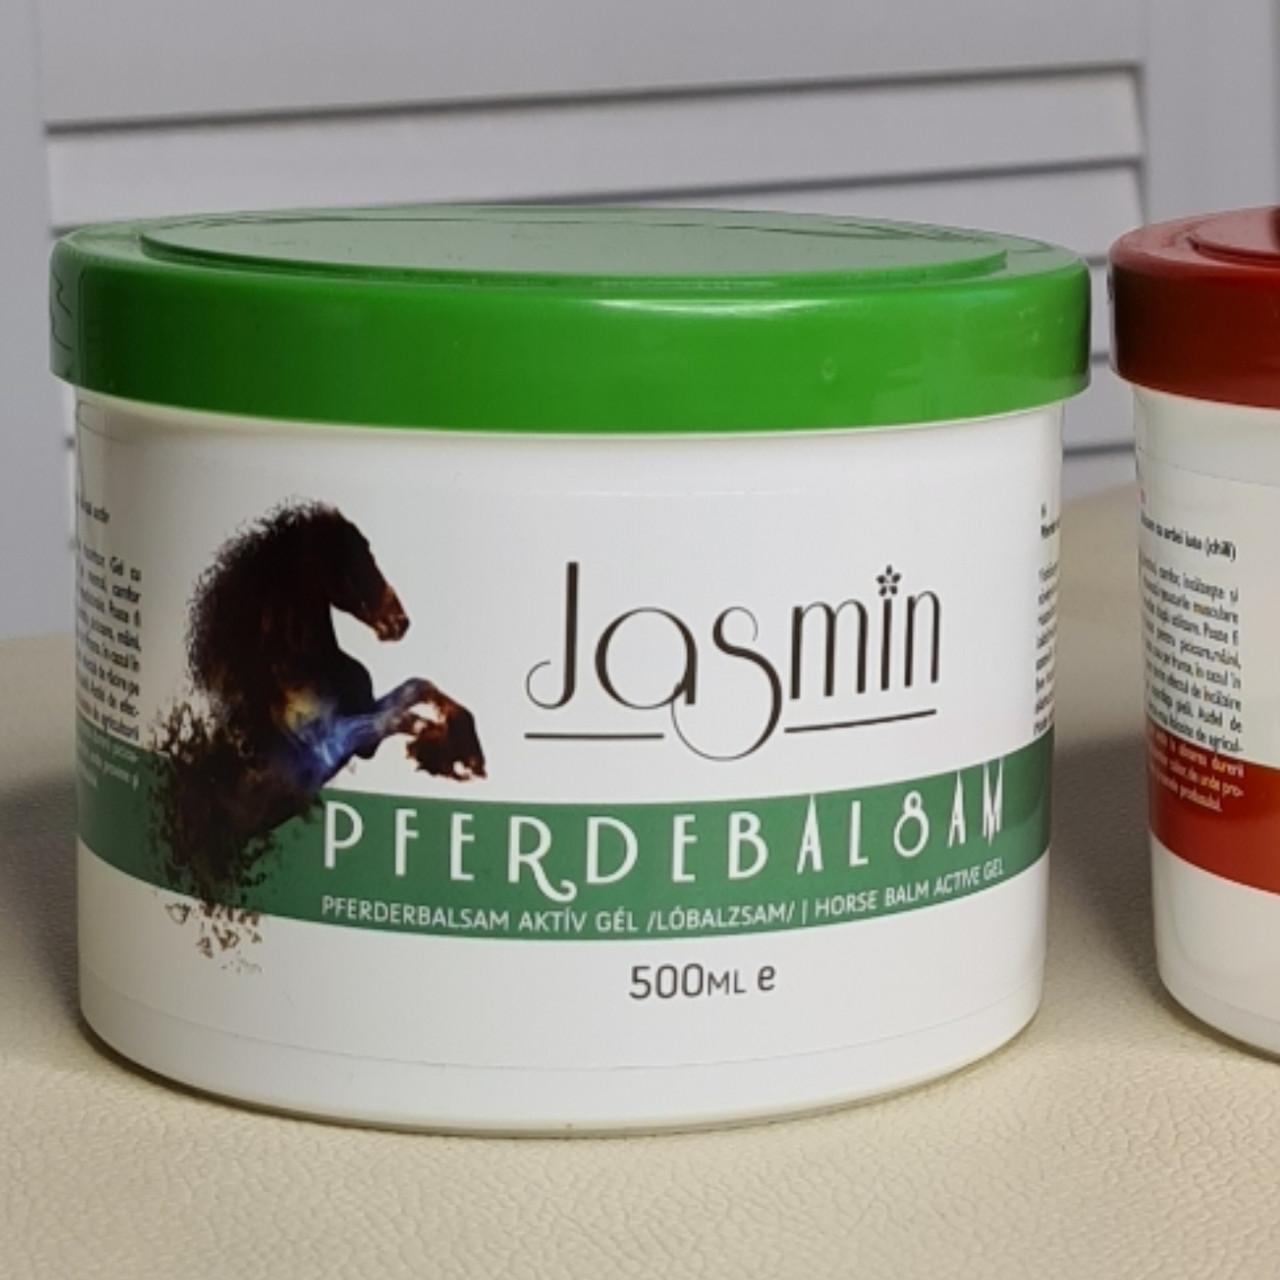 Охолоджуючий гель з ментолом камфорою травами Pferdebalsam jasmin chili balsam